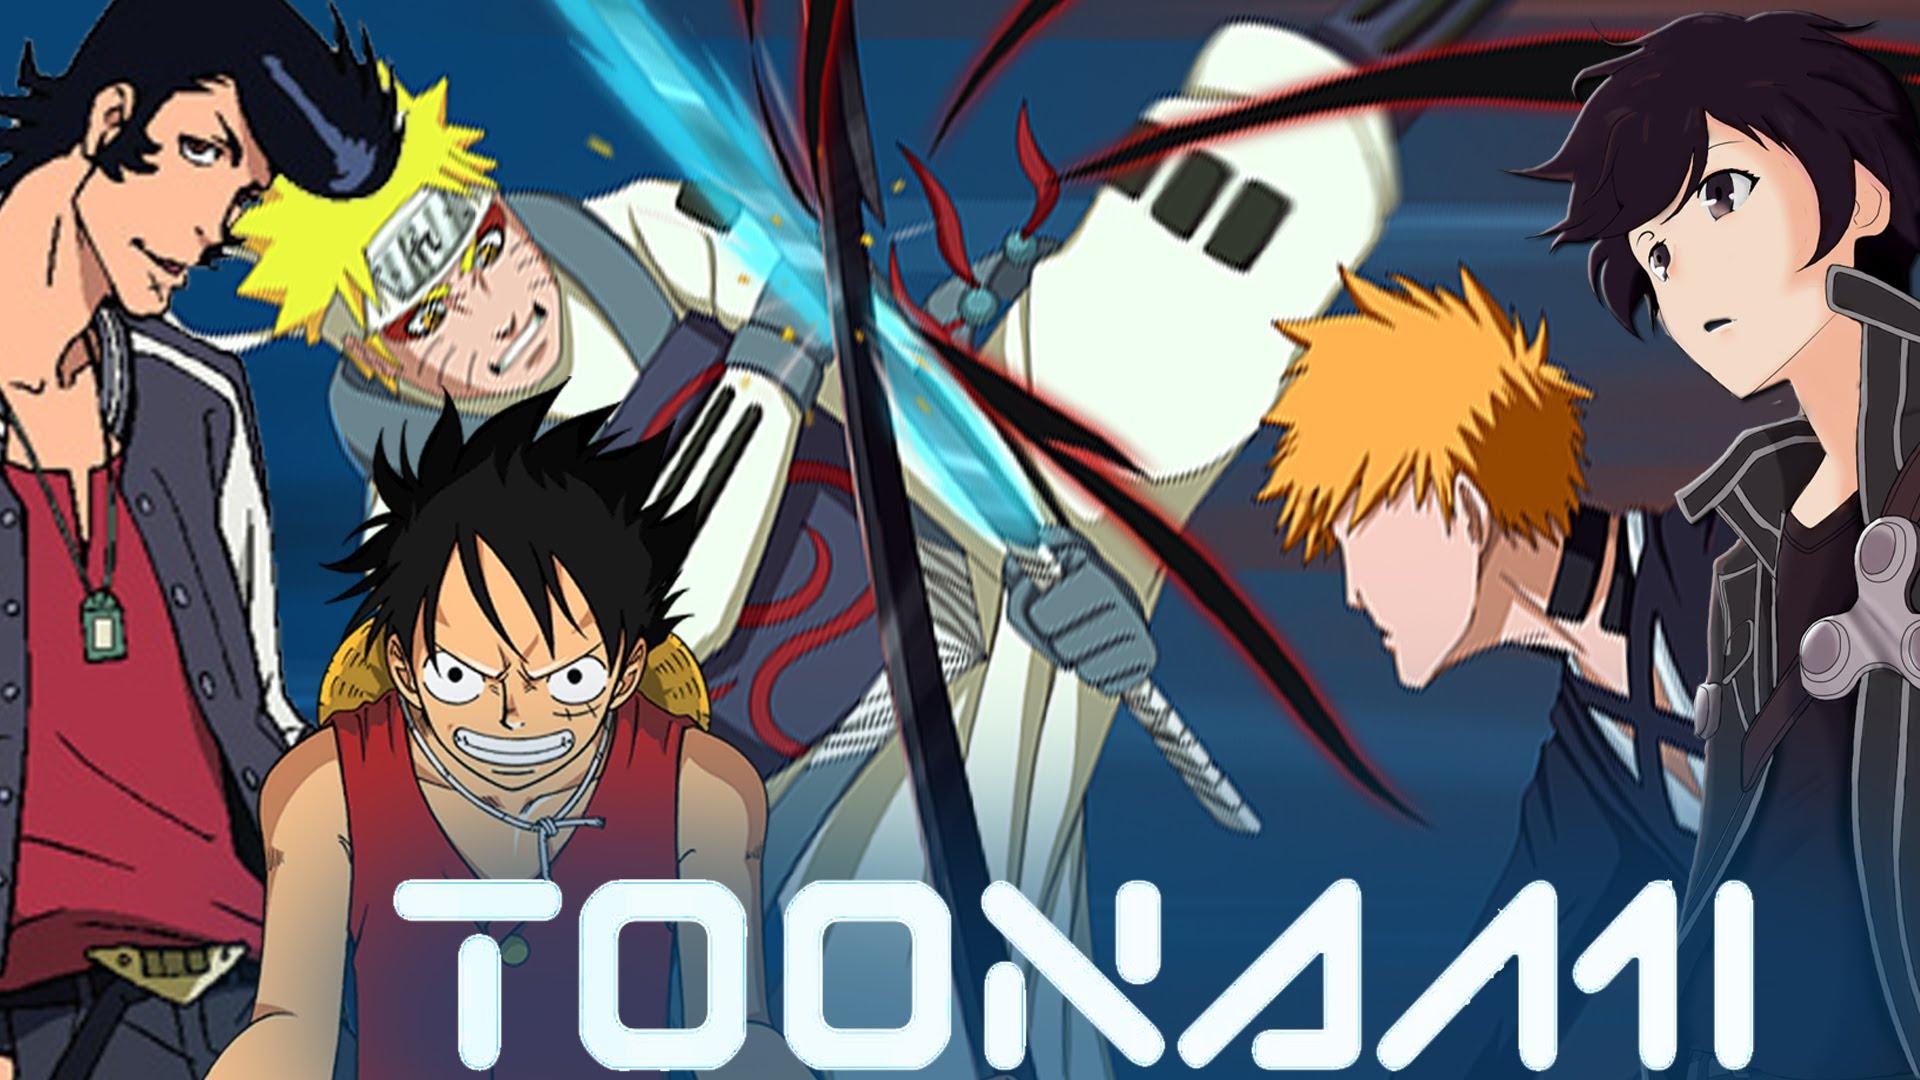 toonami reveals 2014 schedule space dandy shippuden premiere